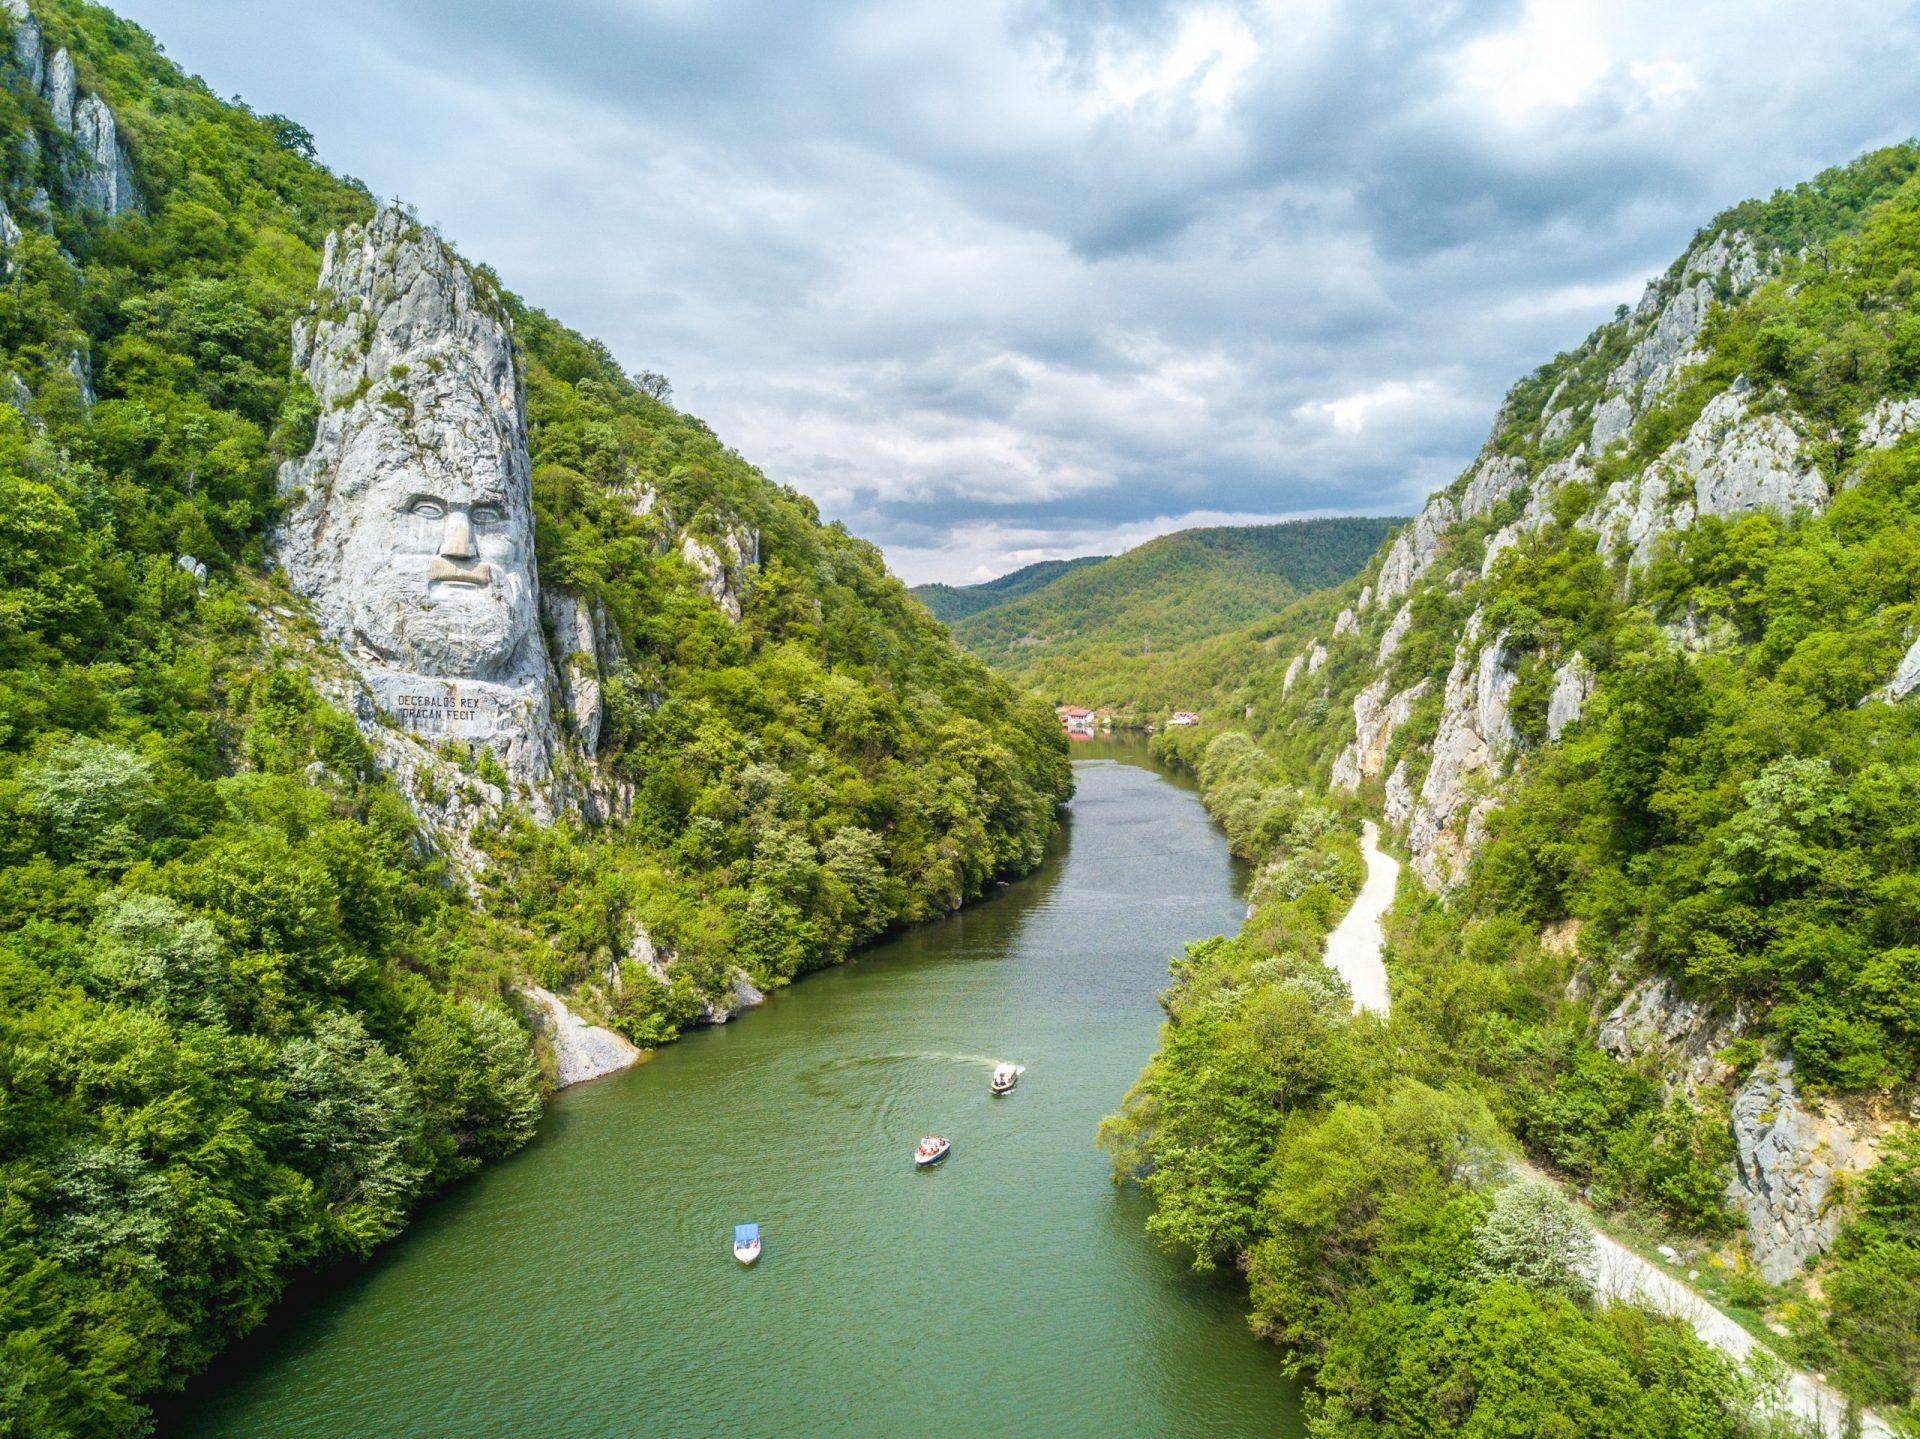 Dacebal's statue - the Danube Gorges